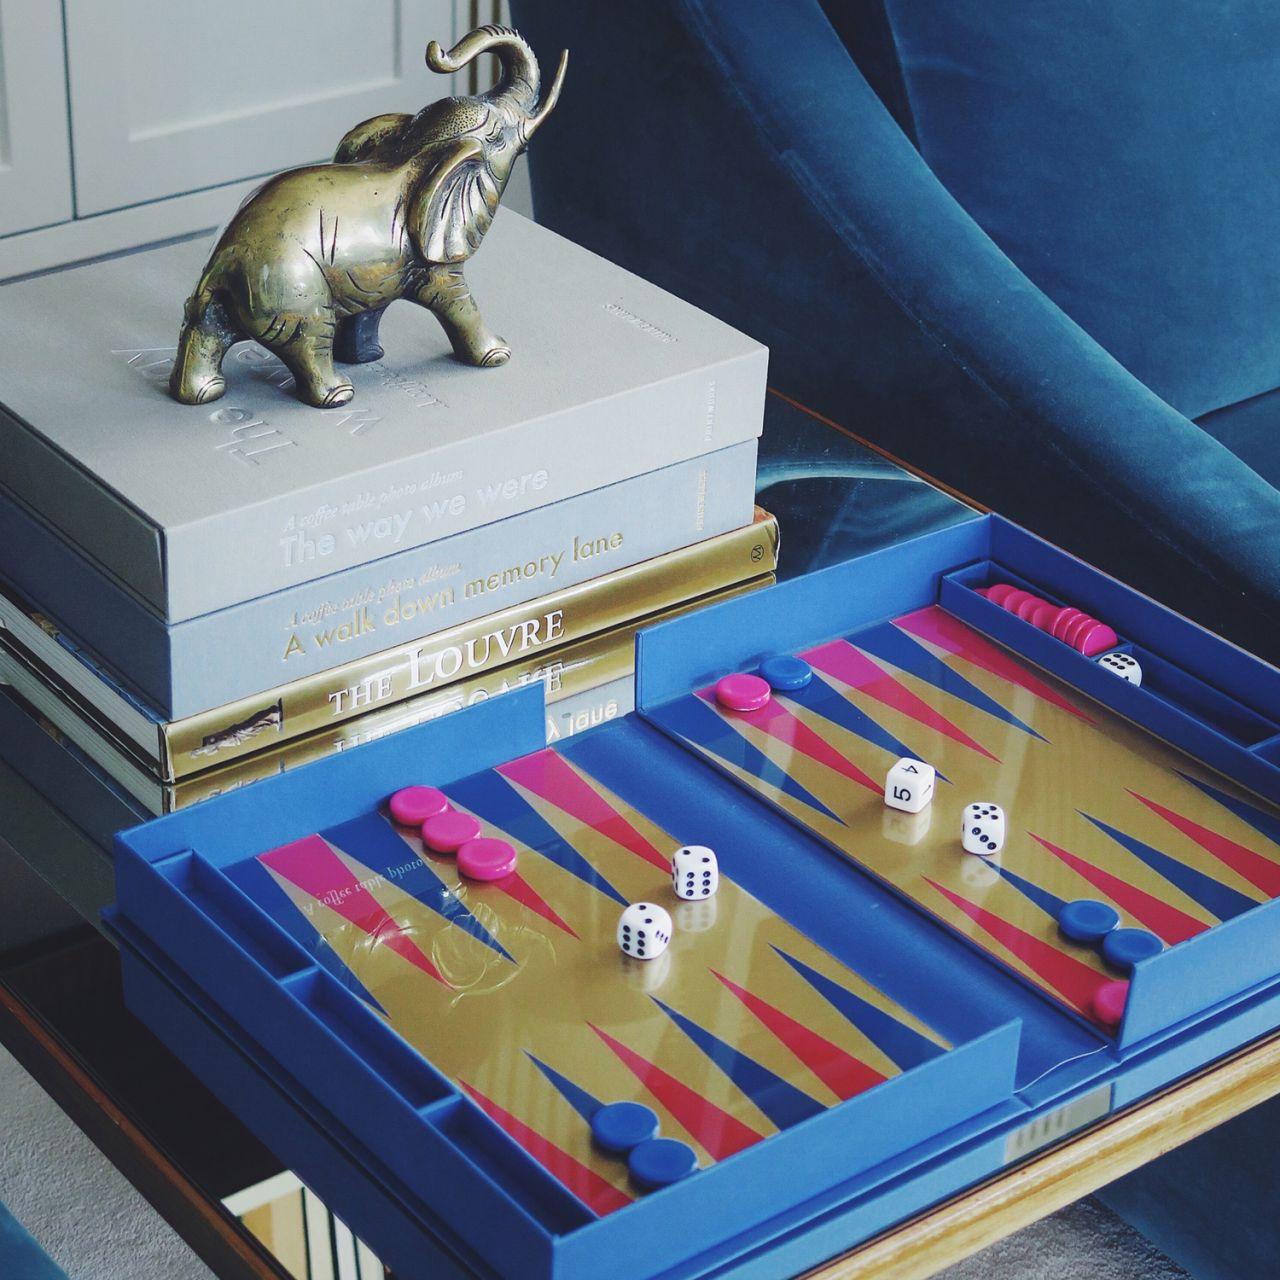 jeu de backgammon printworks